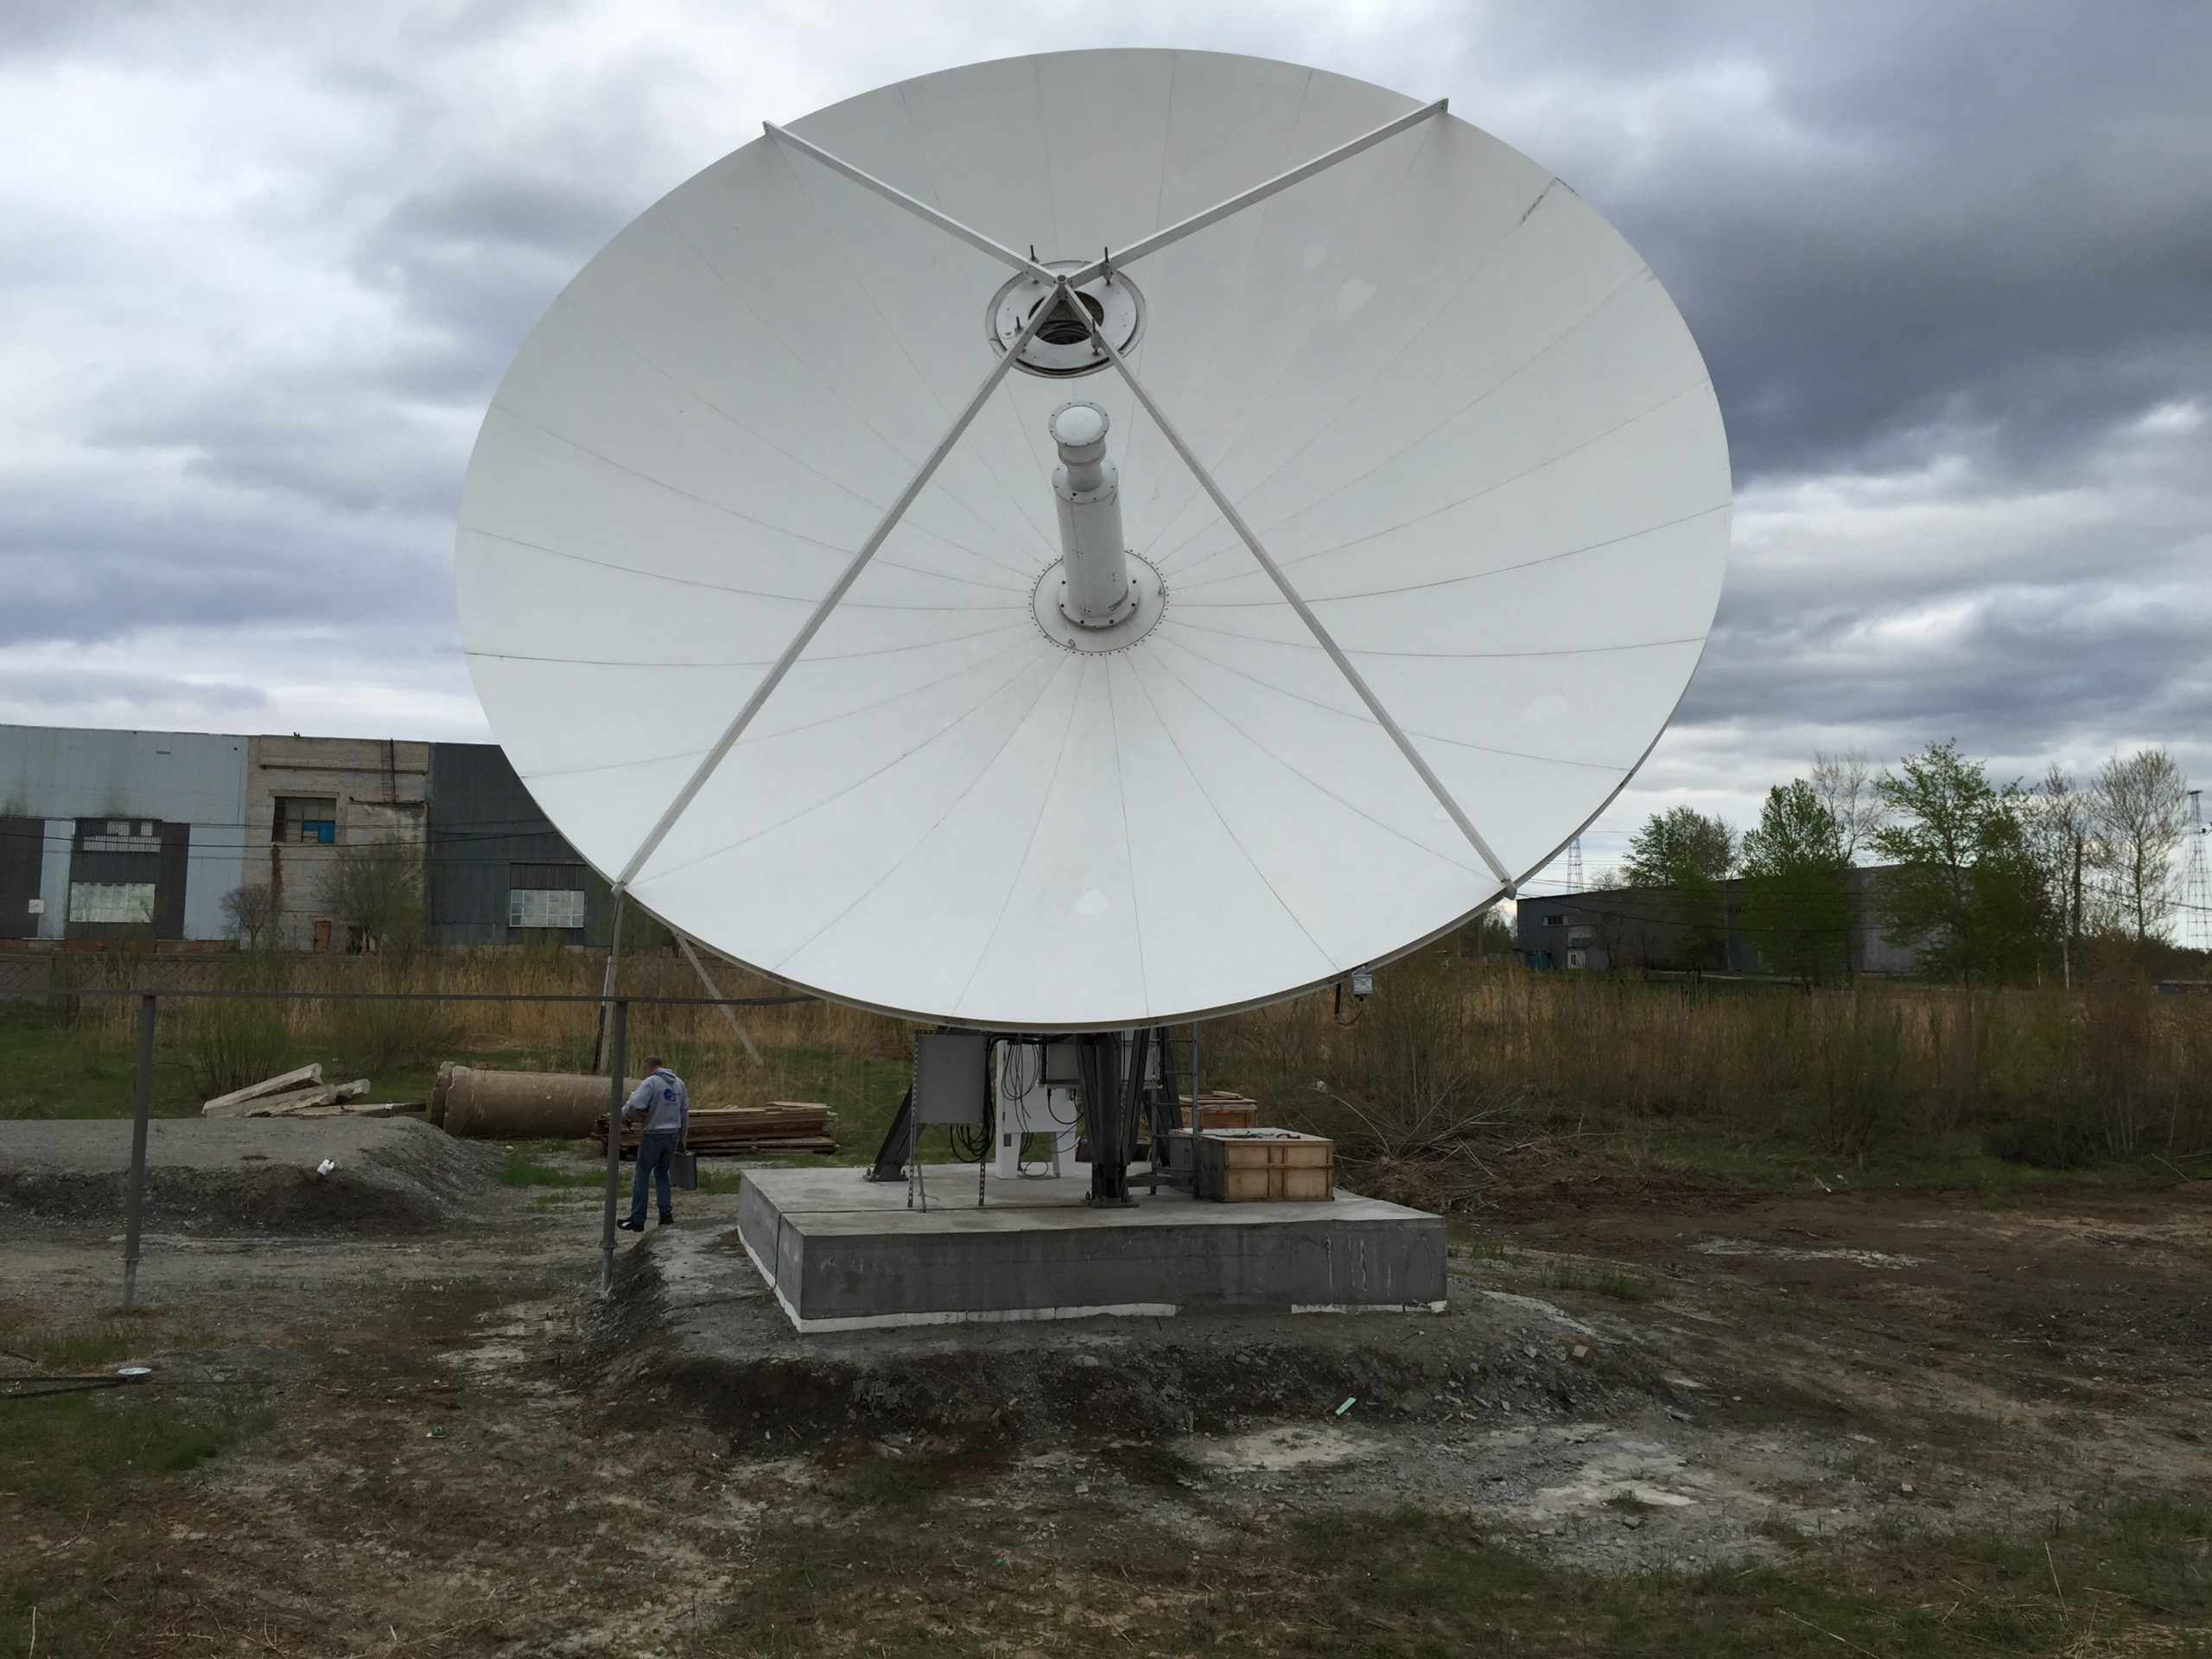 RSI 9.2m antenna in Khabarovsk Russia